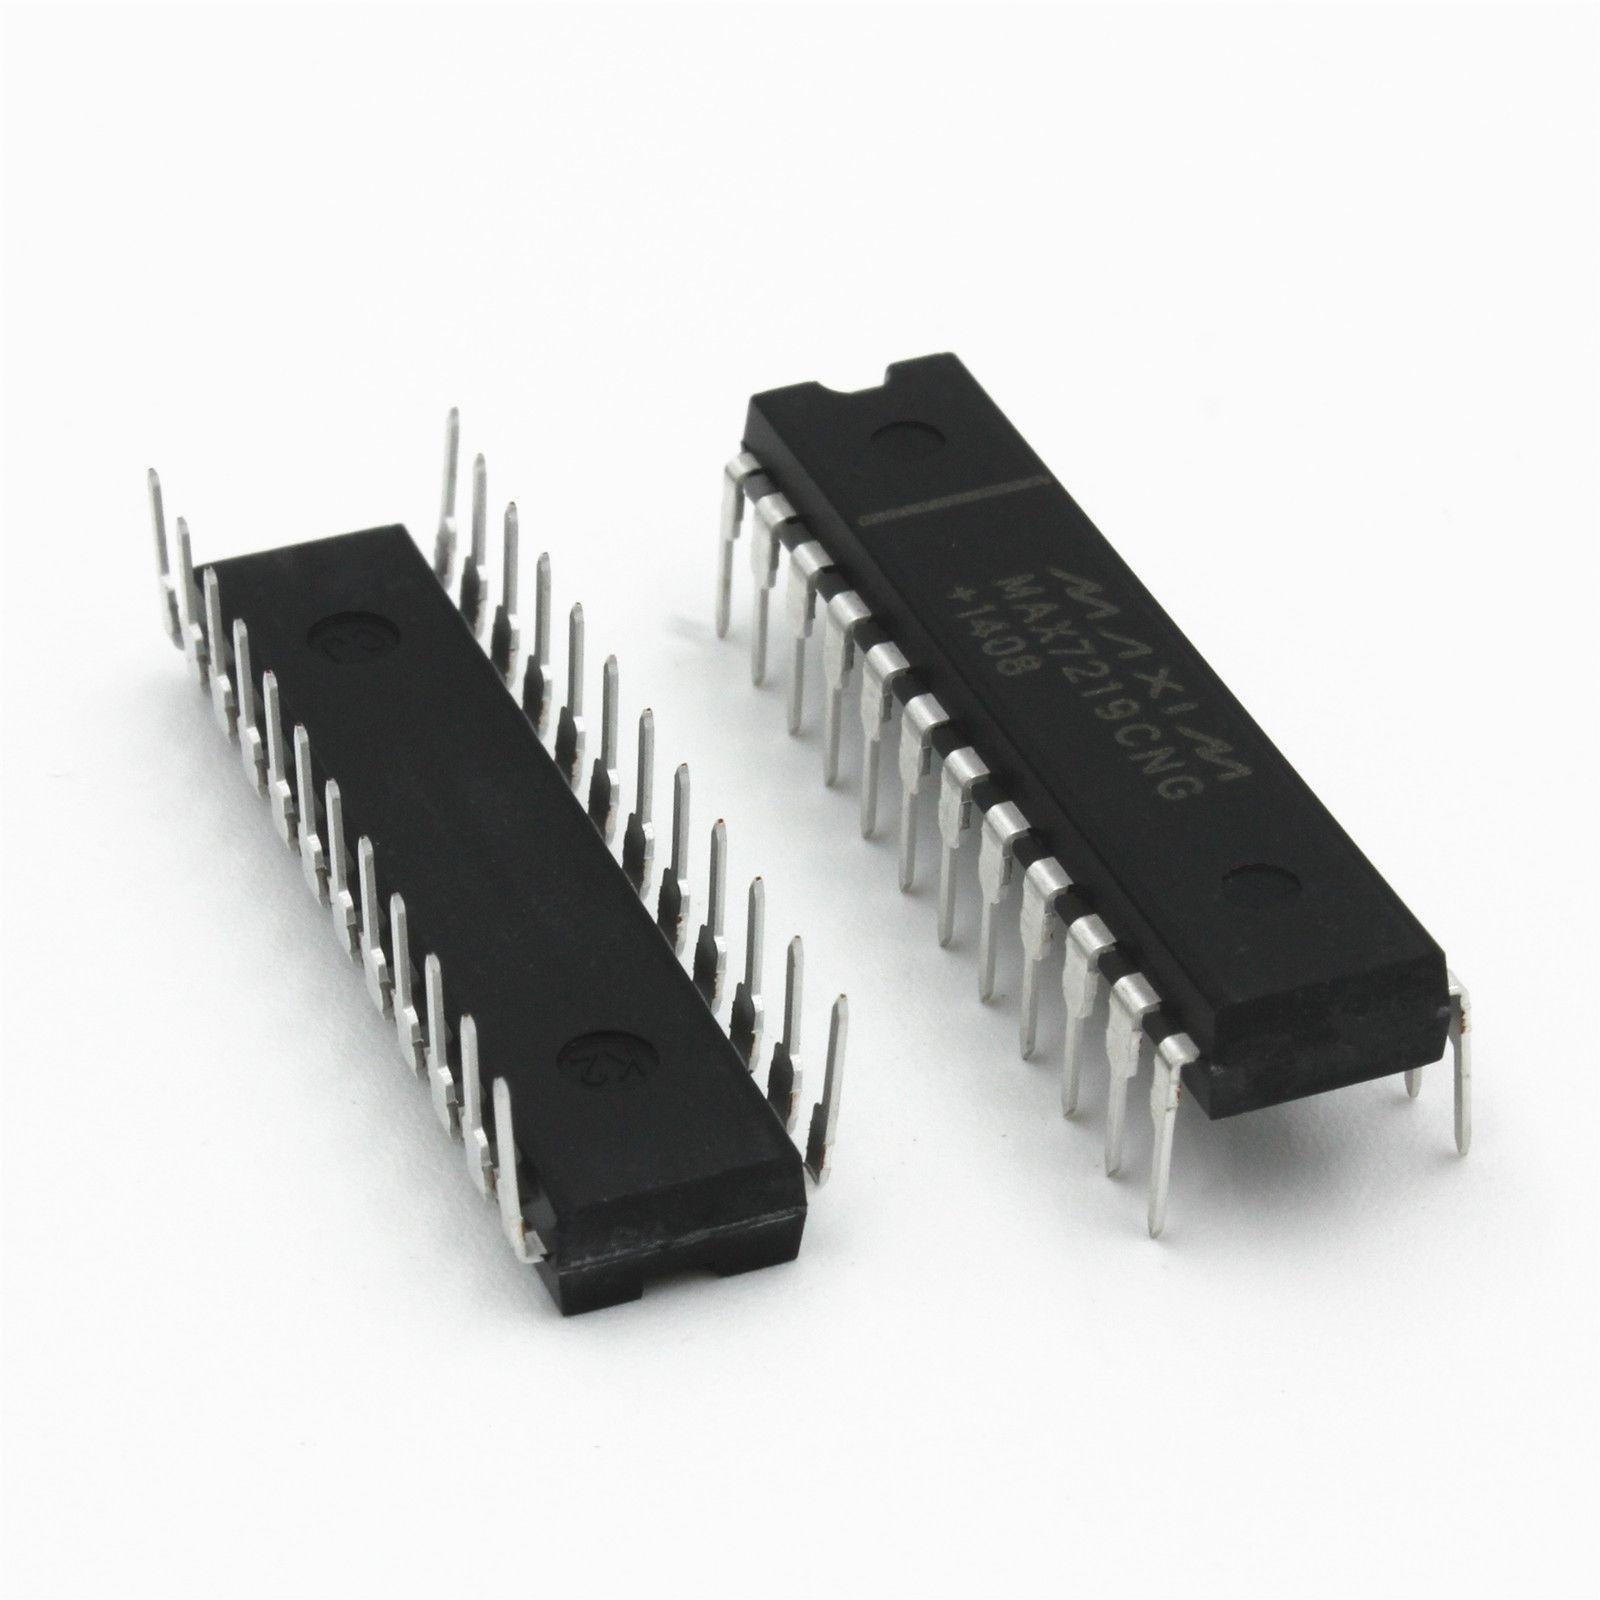 Circuito Integrado : Circuitos integrados y microcontroladores circuito integrado